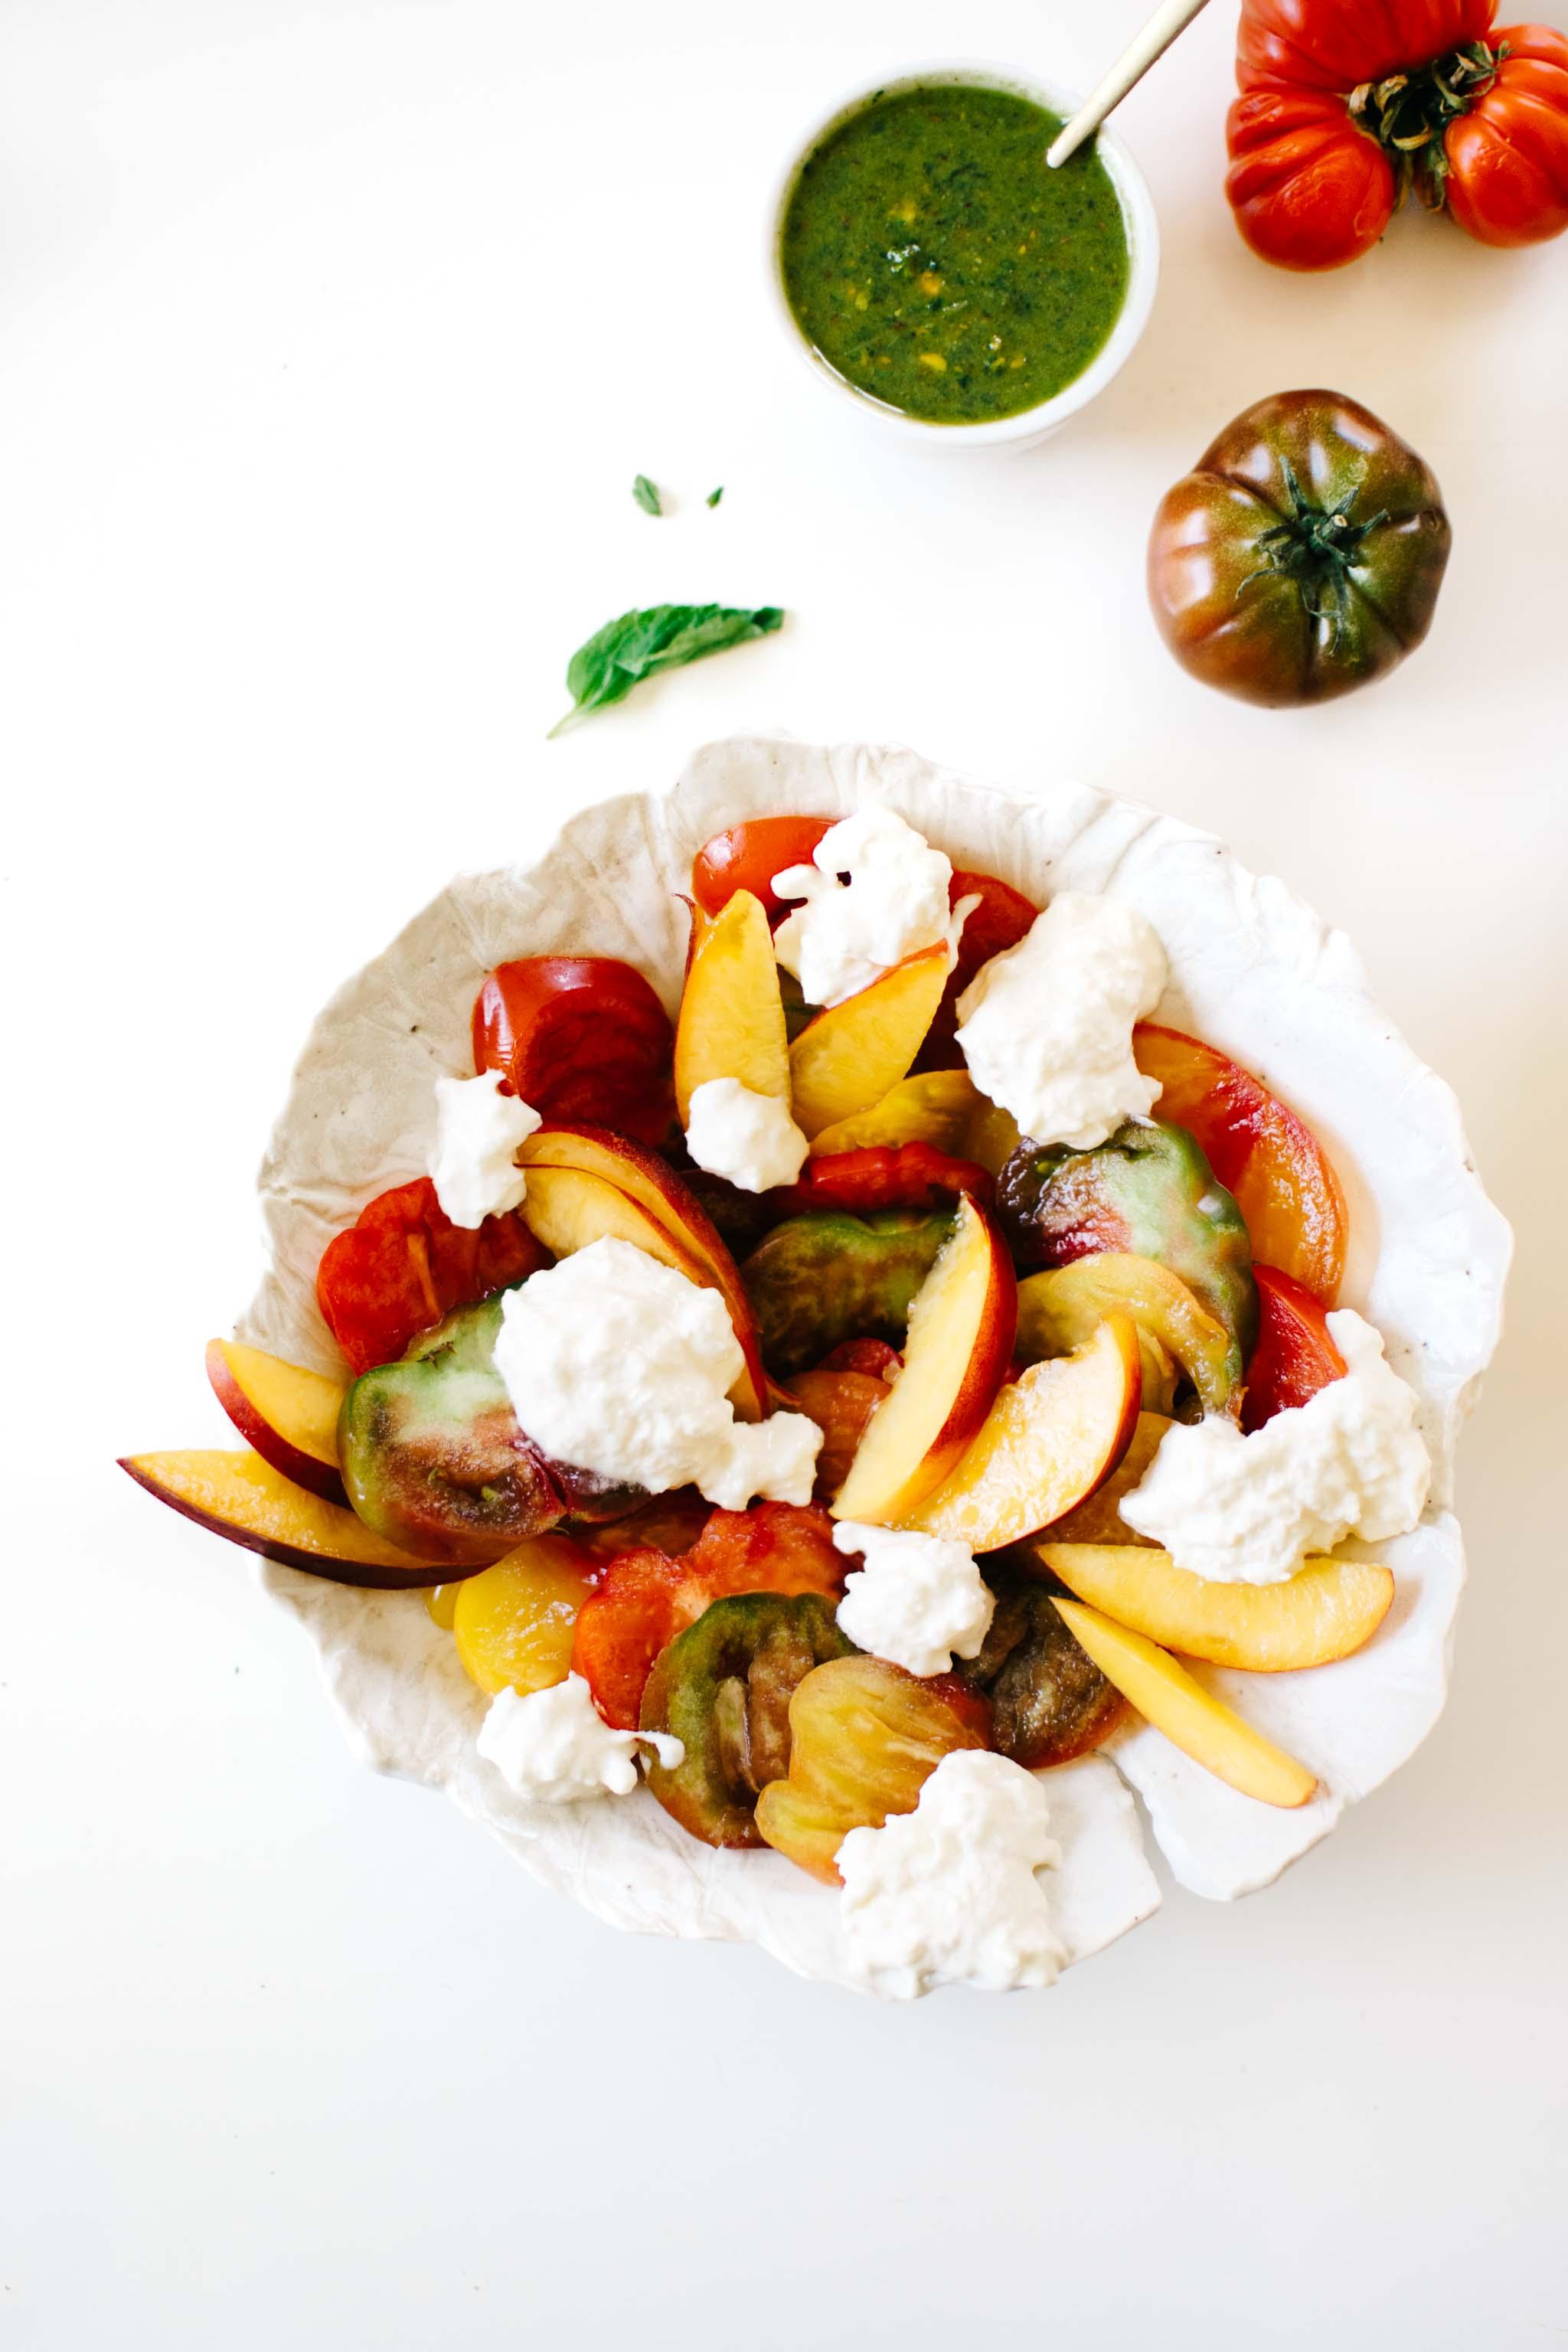 Heirloom Tomato, Nectarine & Burrata Caprese Salad with Pistachio Pesto